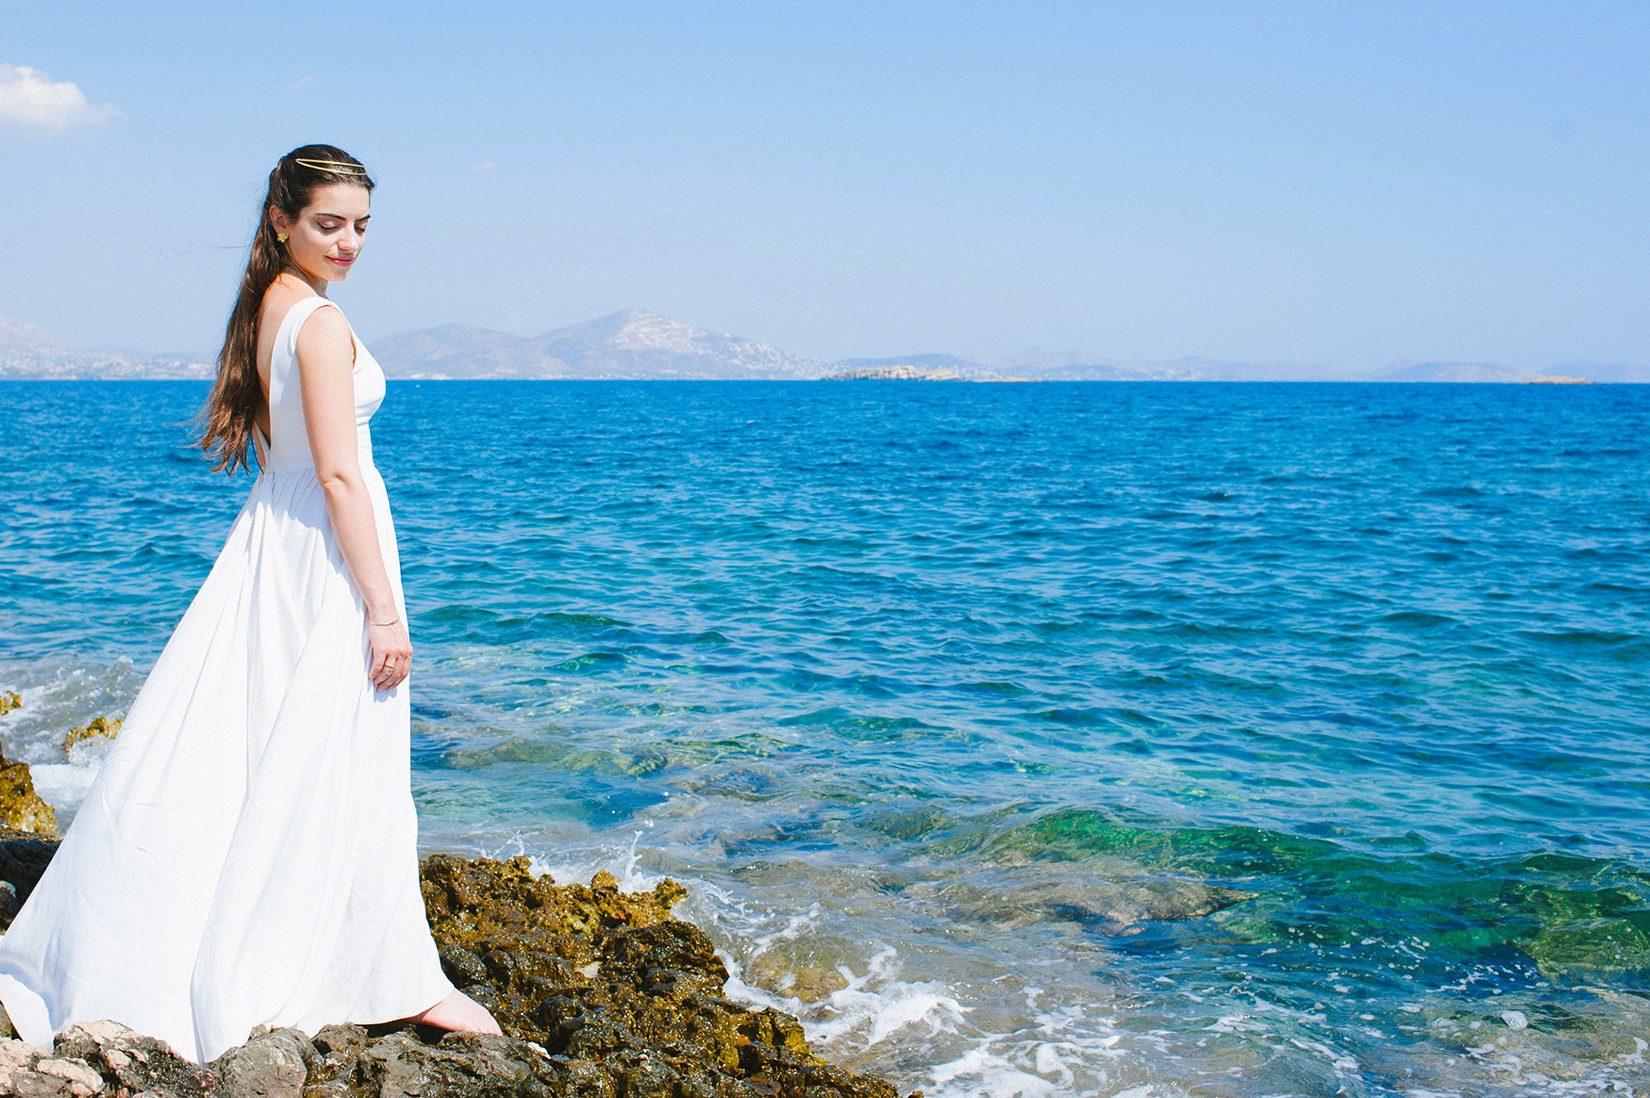 Anastasios Filopoulos Wedding Photography-Theodora & Kesavan | Wedding in Ble Azure Athens Riviera